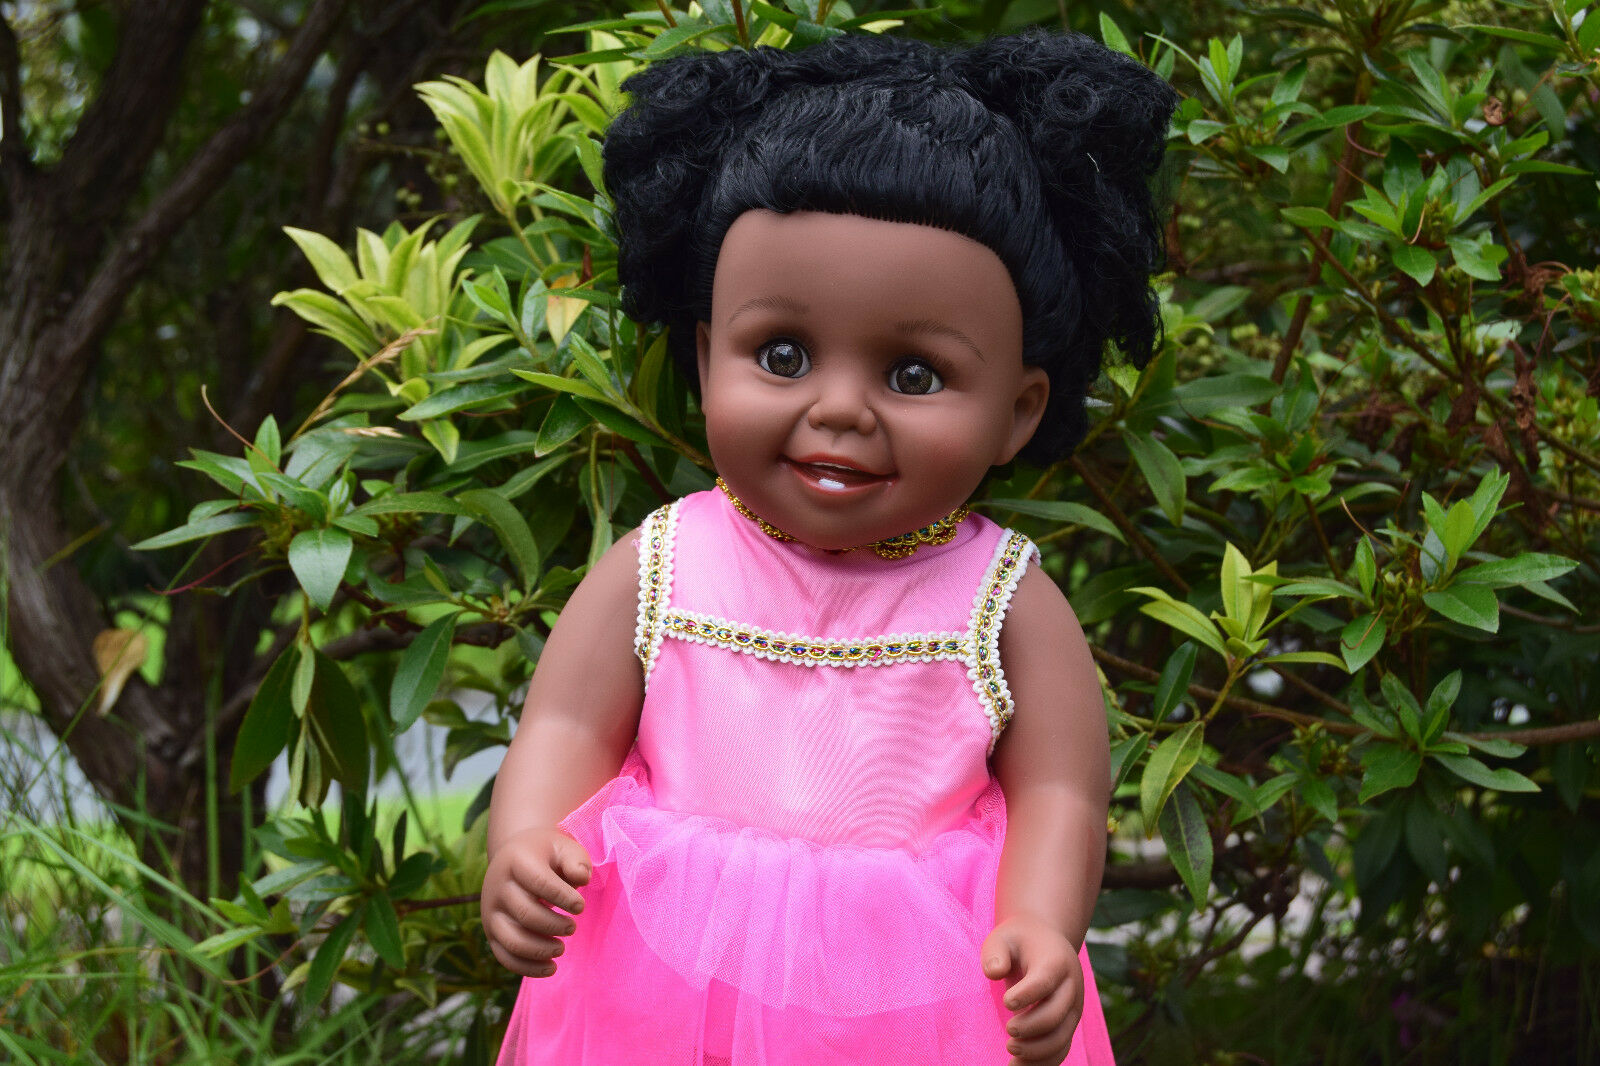 16  Lina Afro Abito da sera nero pelle Girl bambola vinile 47 cm Smiley Bambola capelli afro